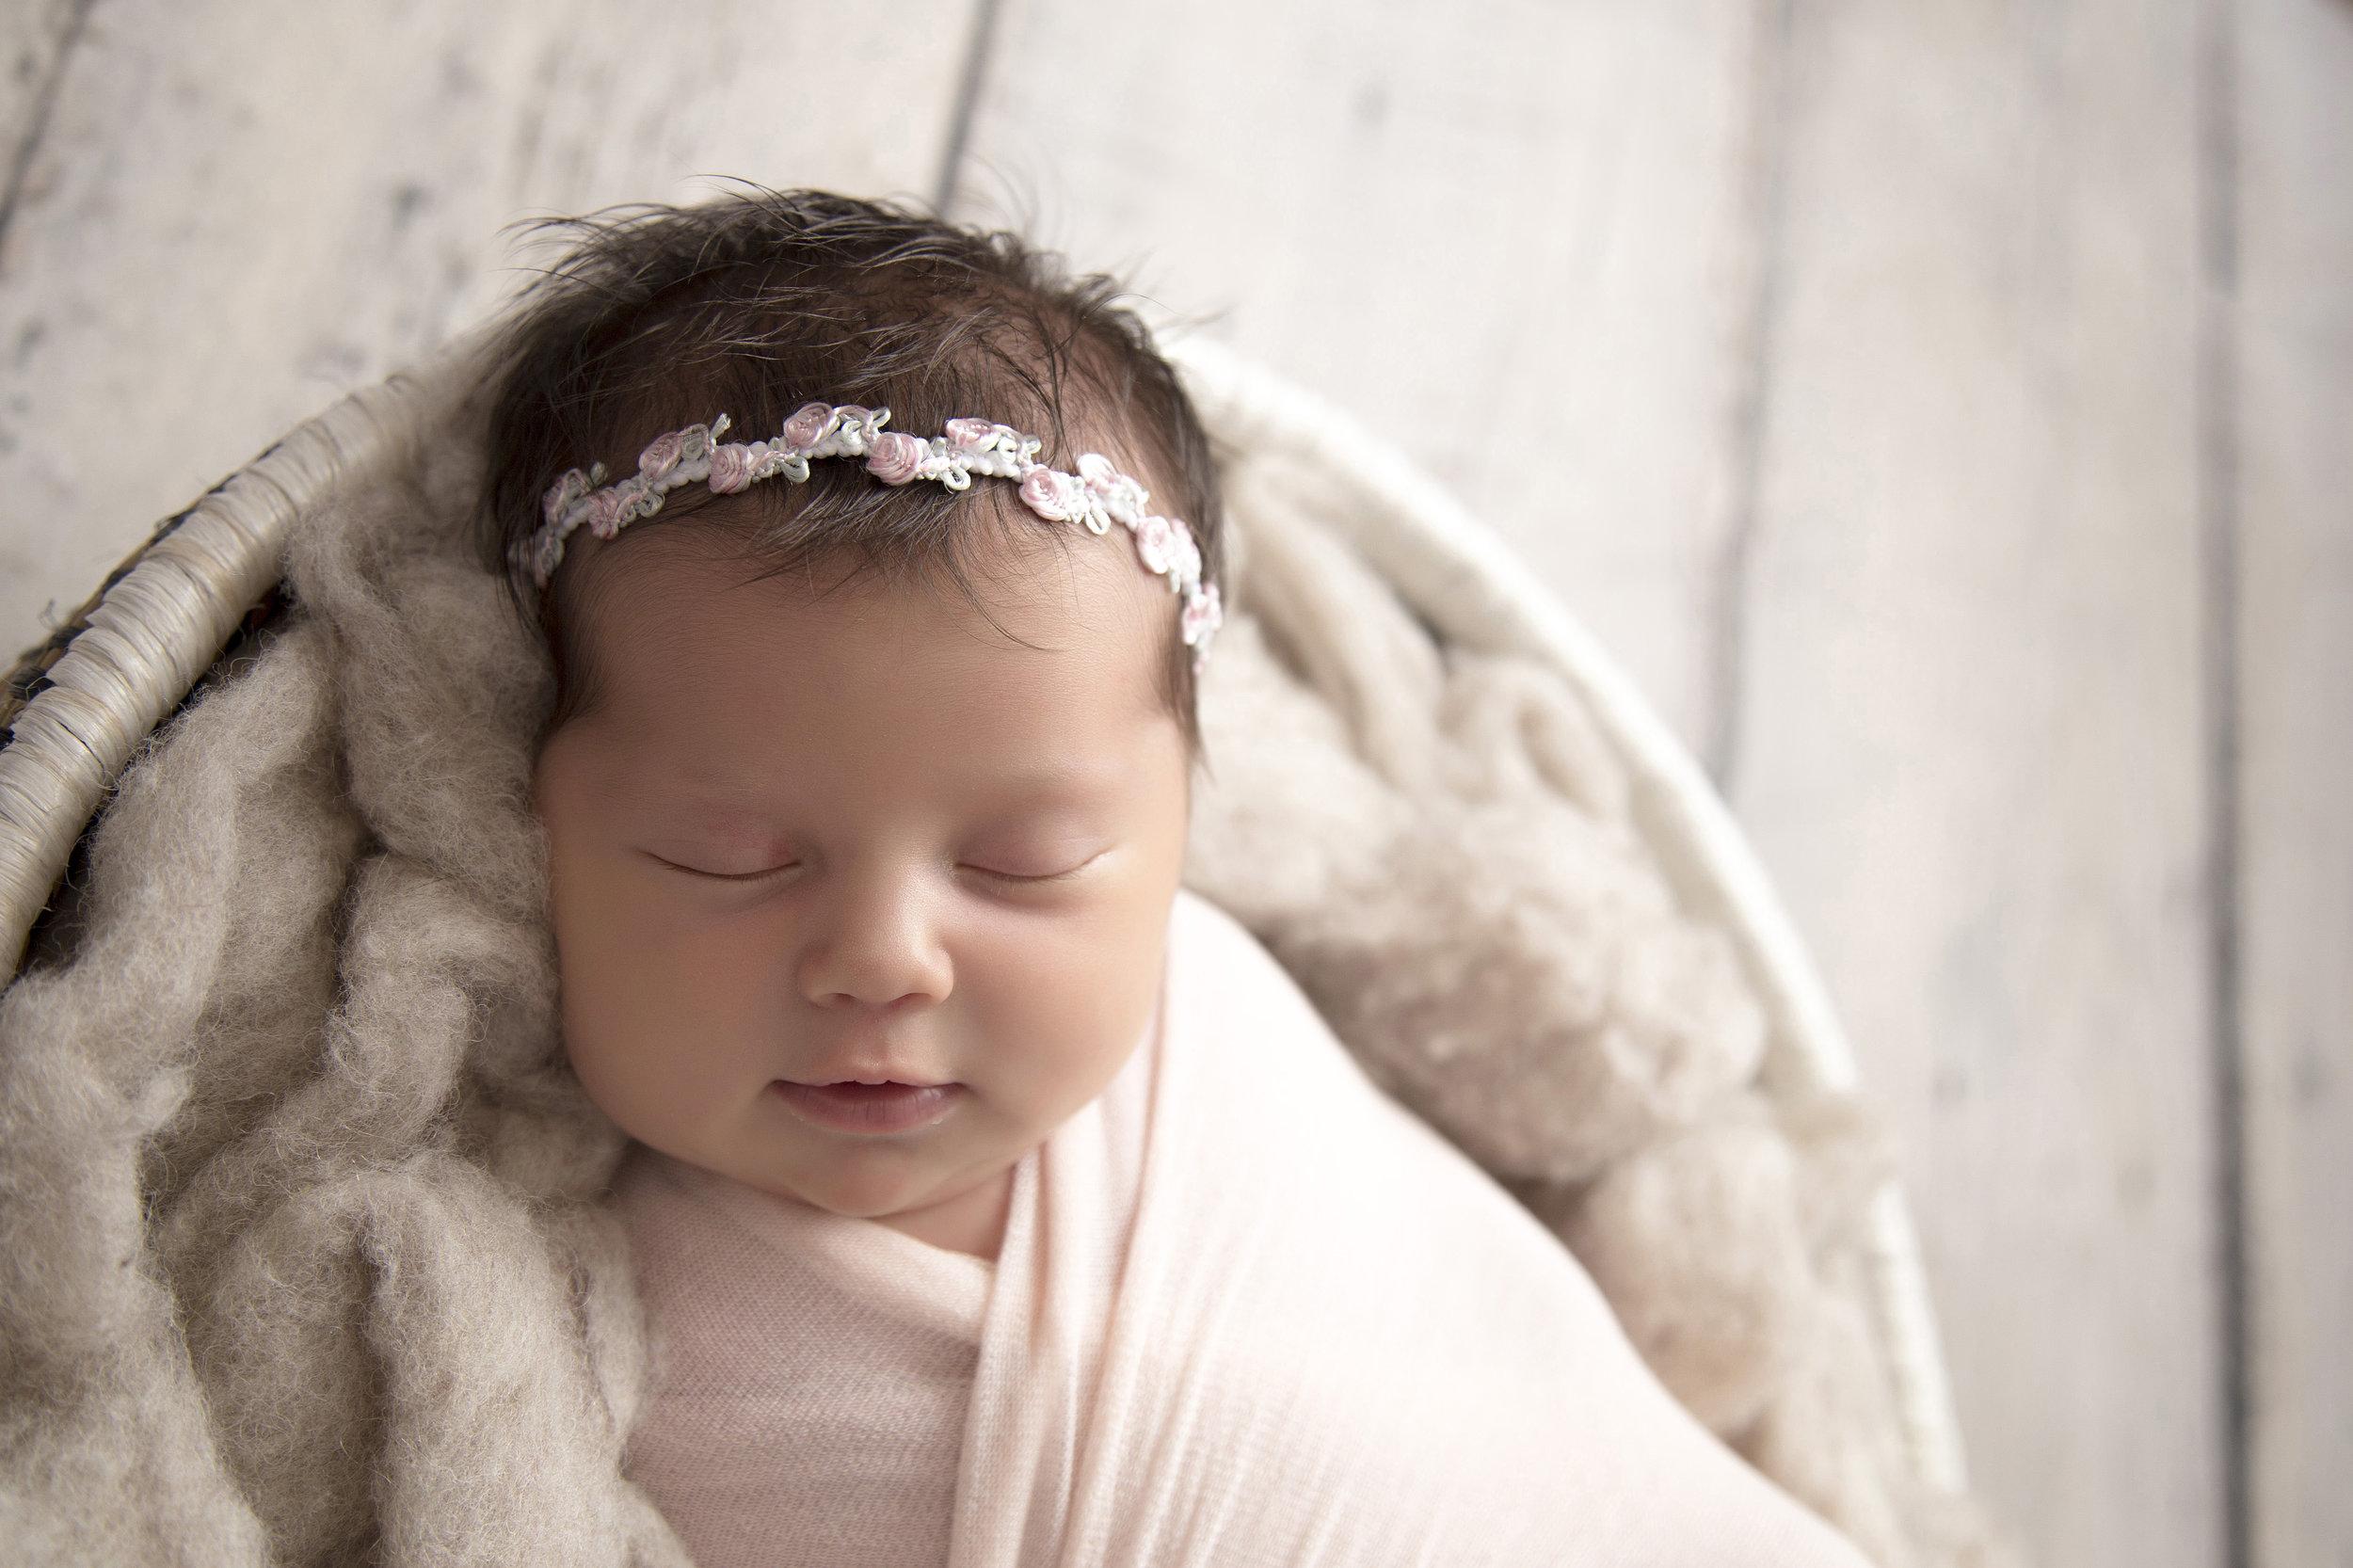 lancaster-newborn-photography-angie-englerth-aep015.jpg